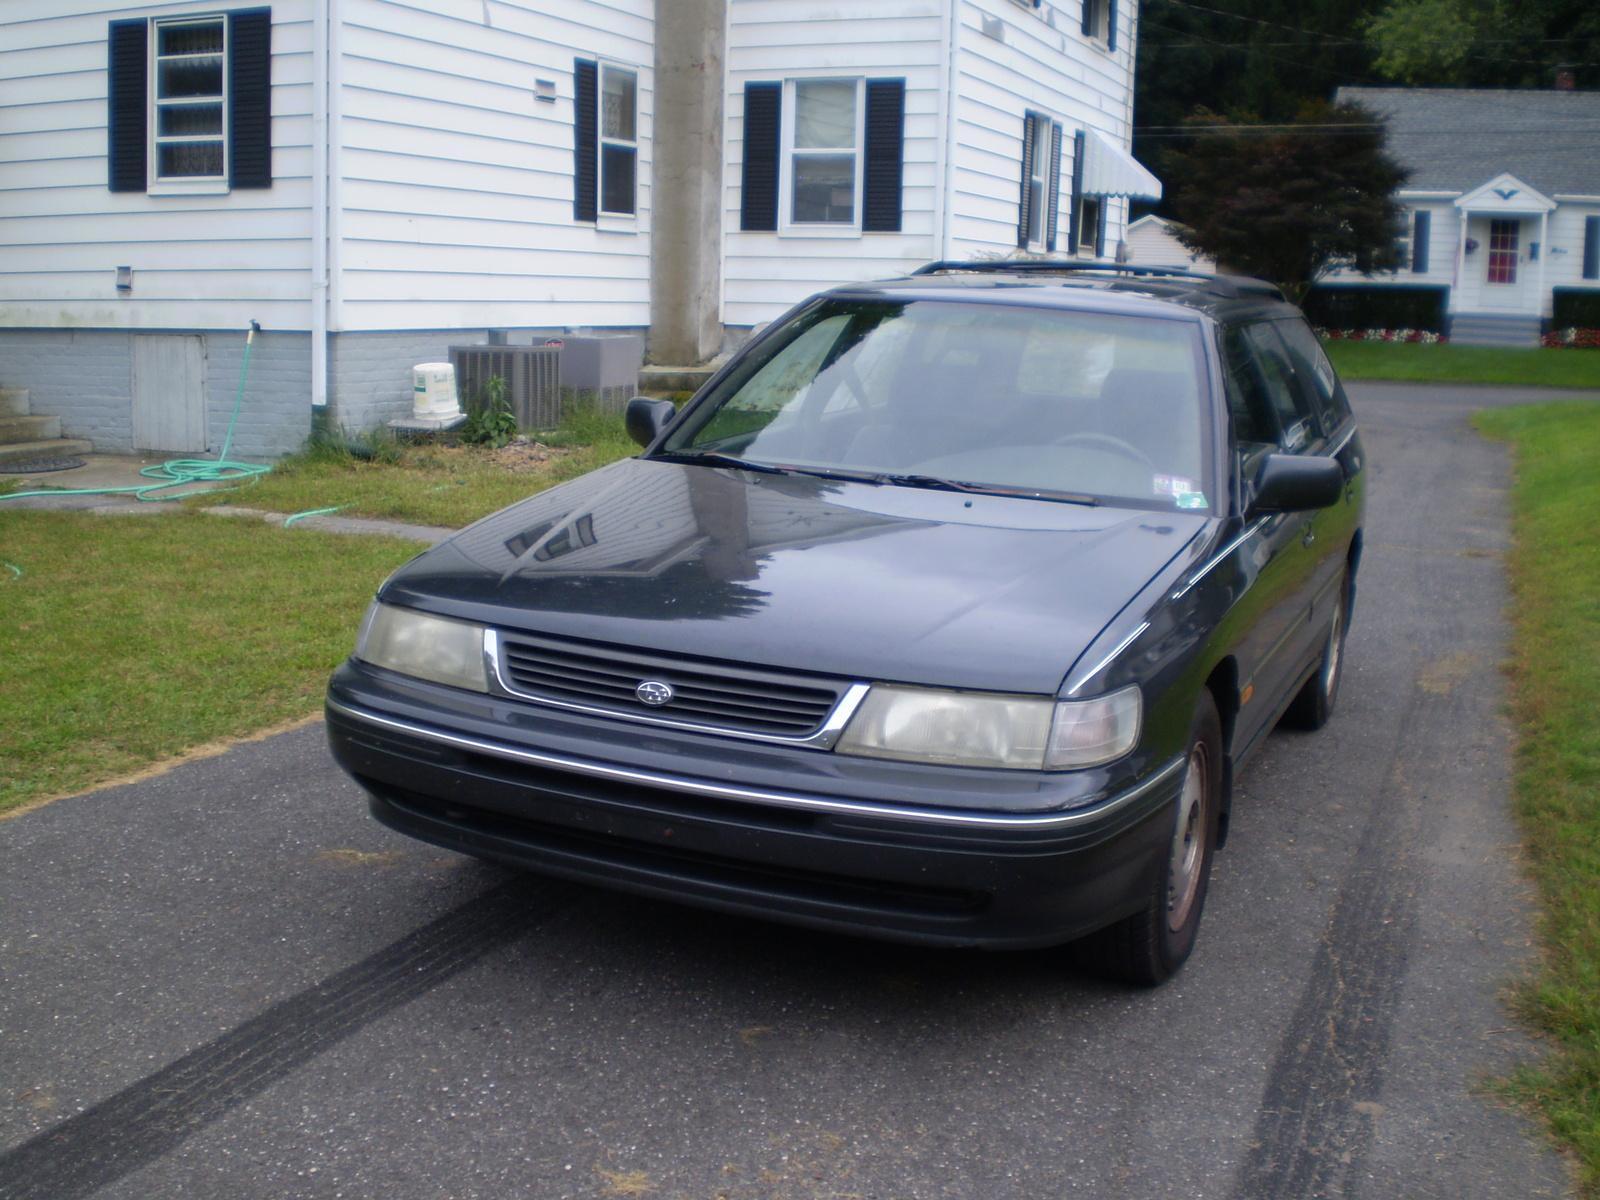 800 1024 1280 1600 Origin 1993 Subaru ...